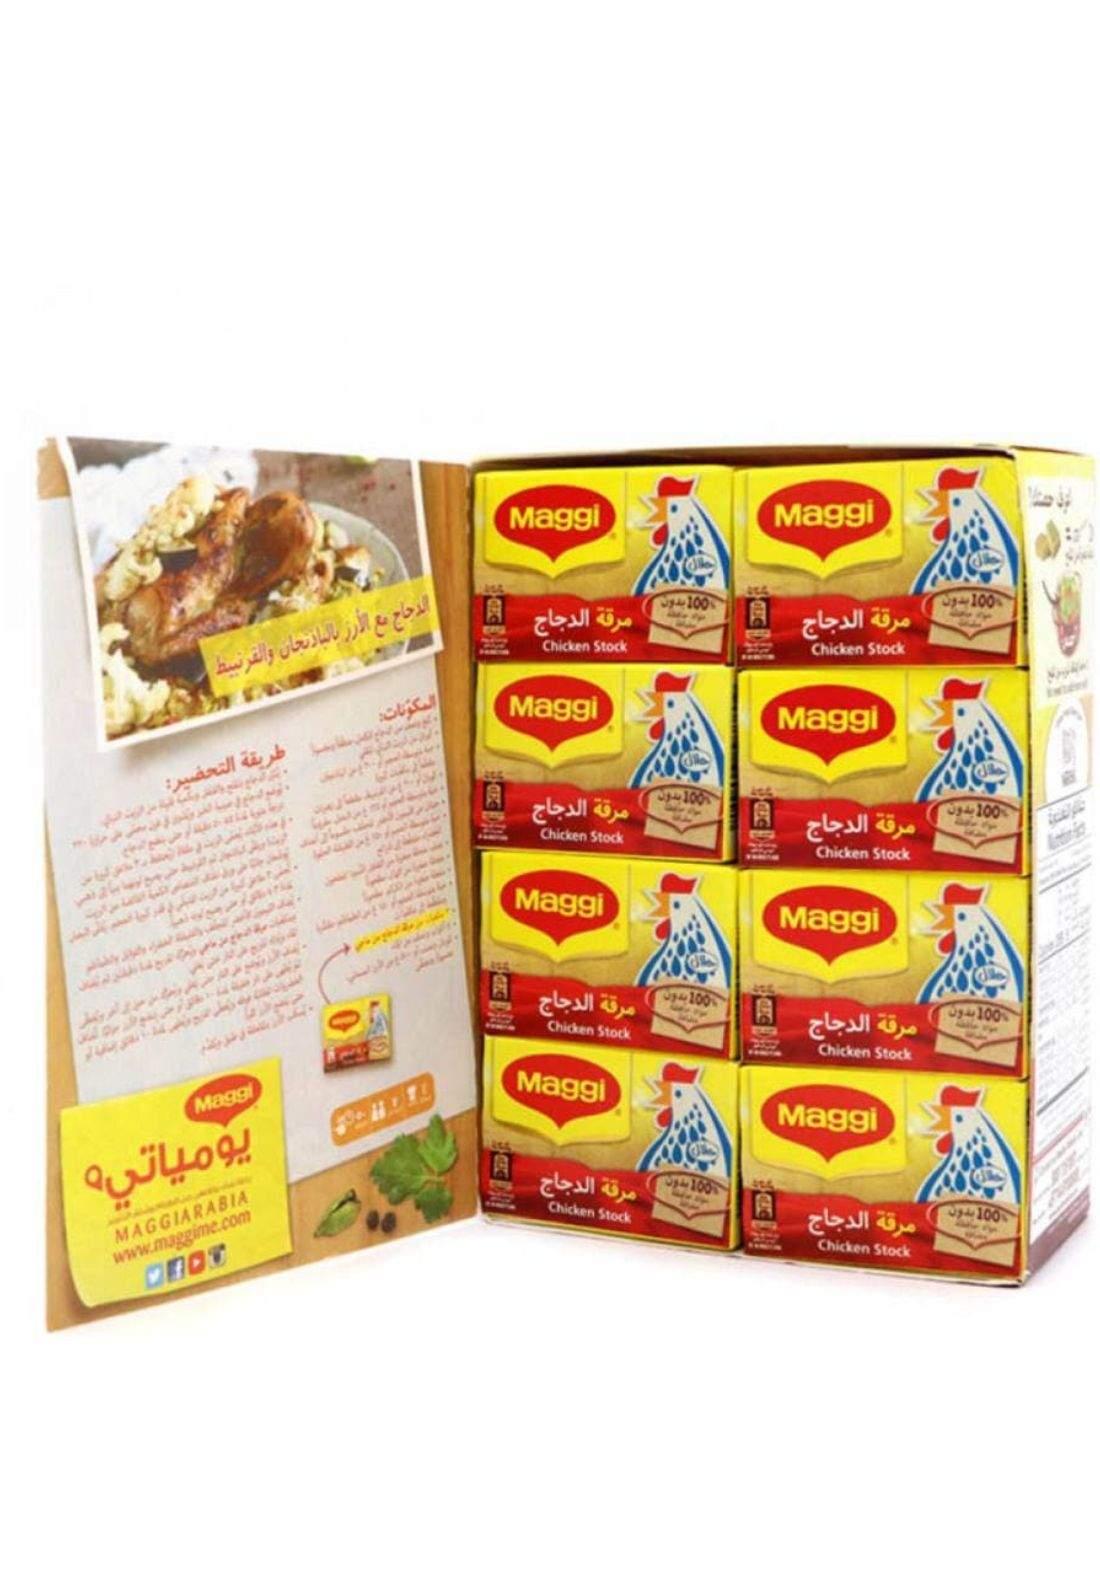 Maggi chicken stock X30 ماجي مرق الدجاج